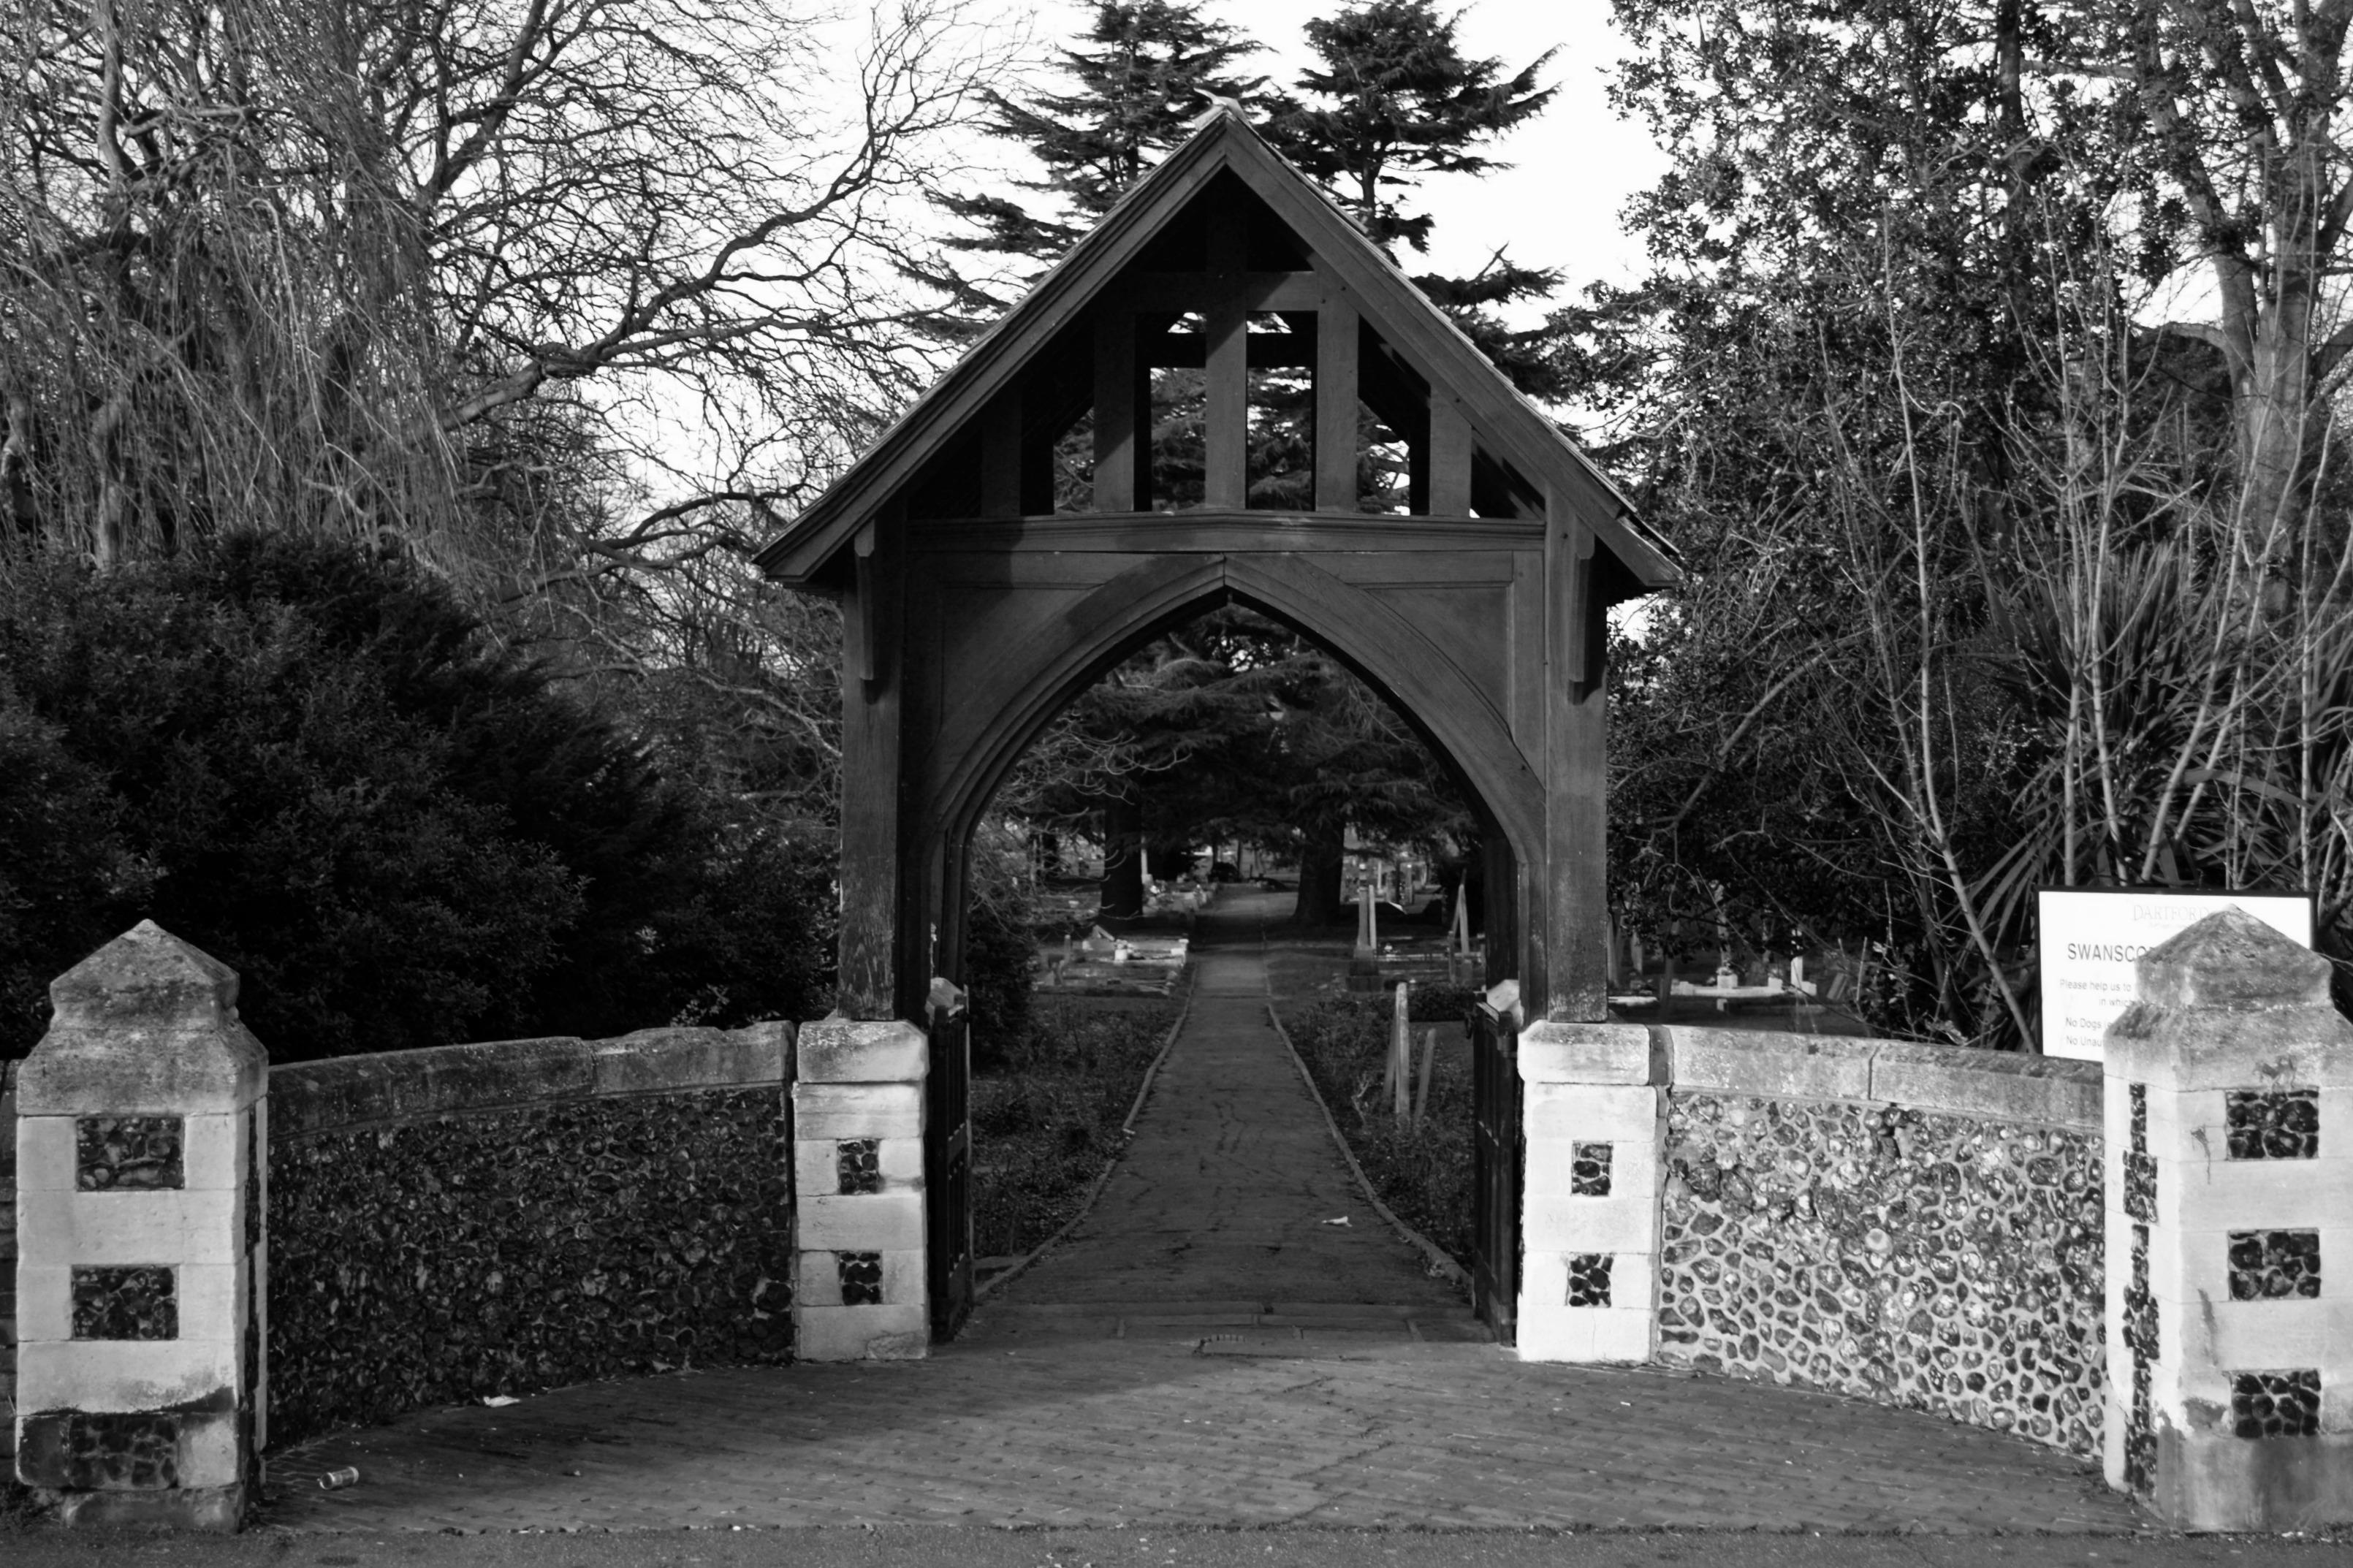 Arch, Swanscombe